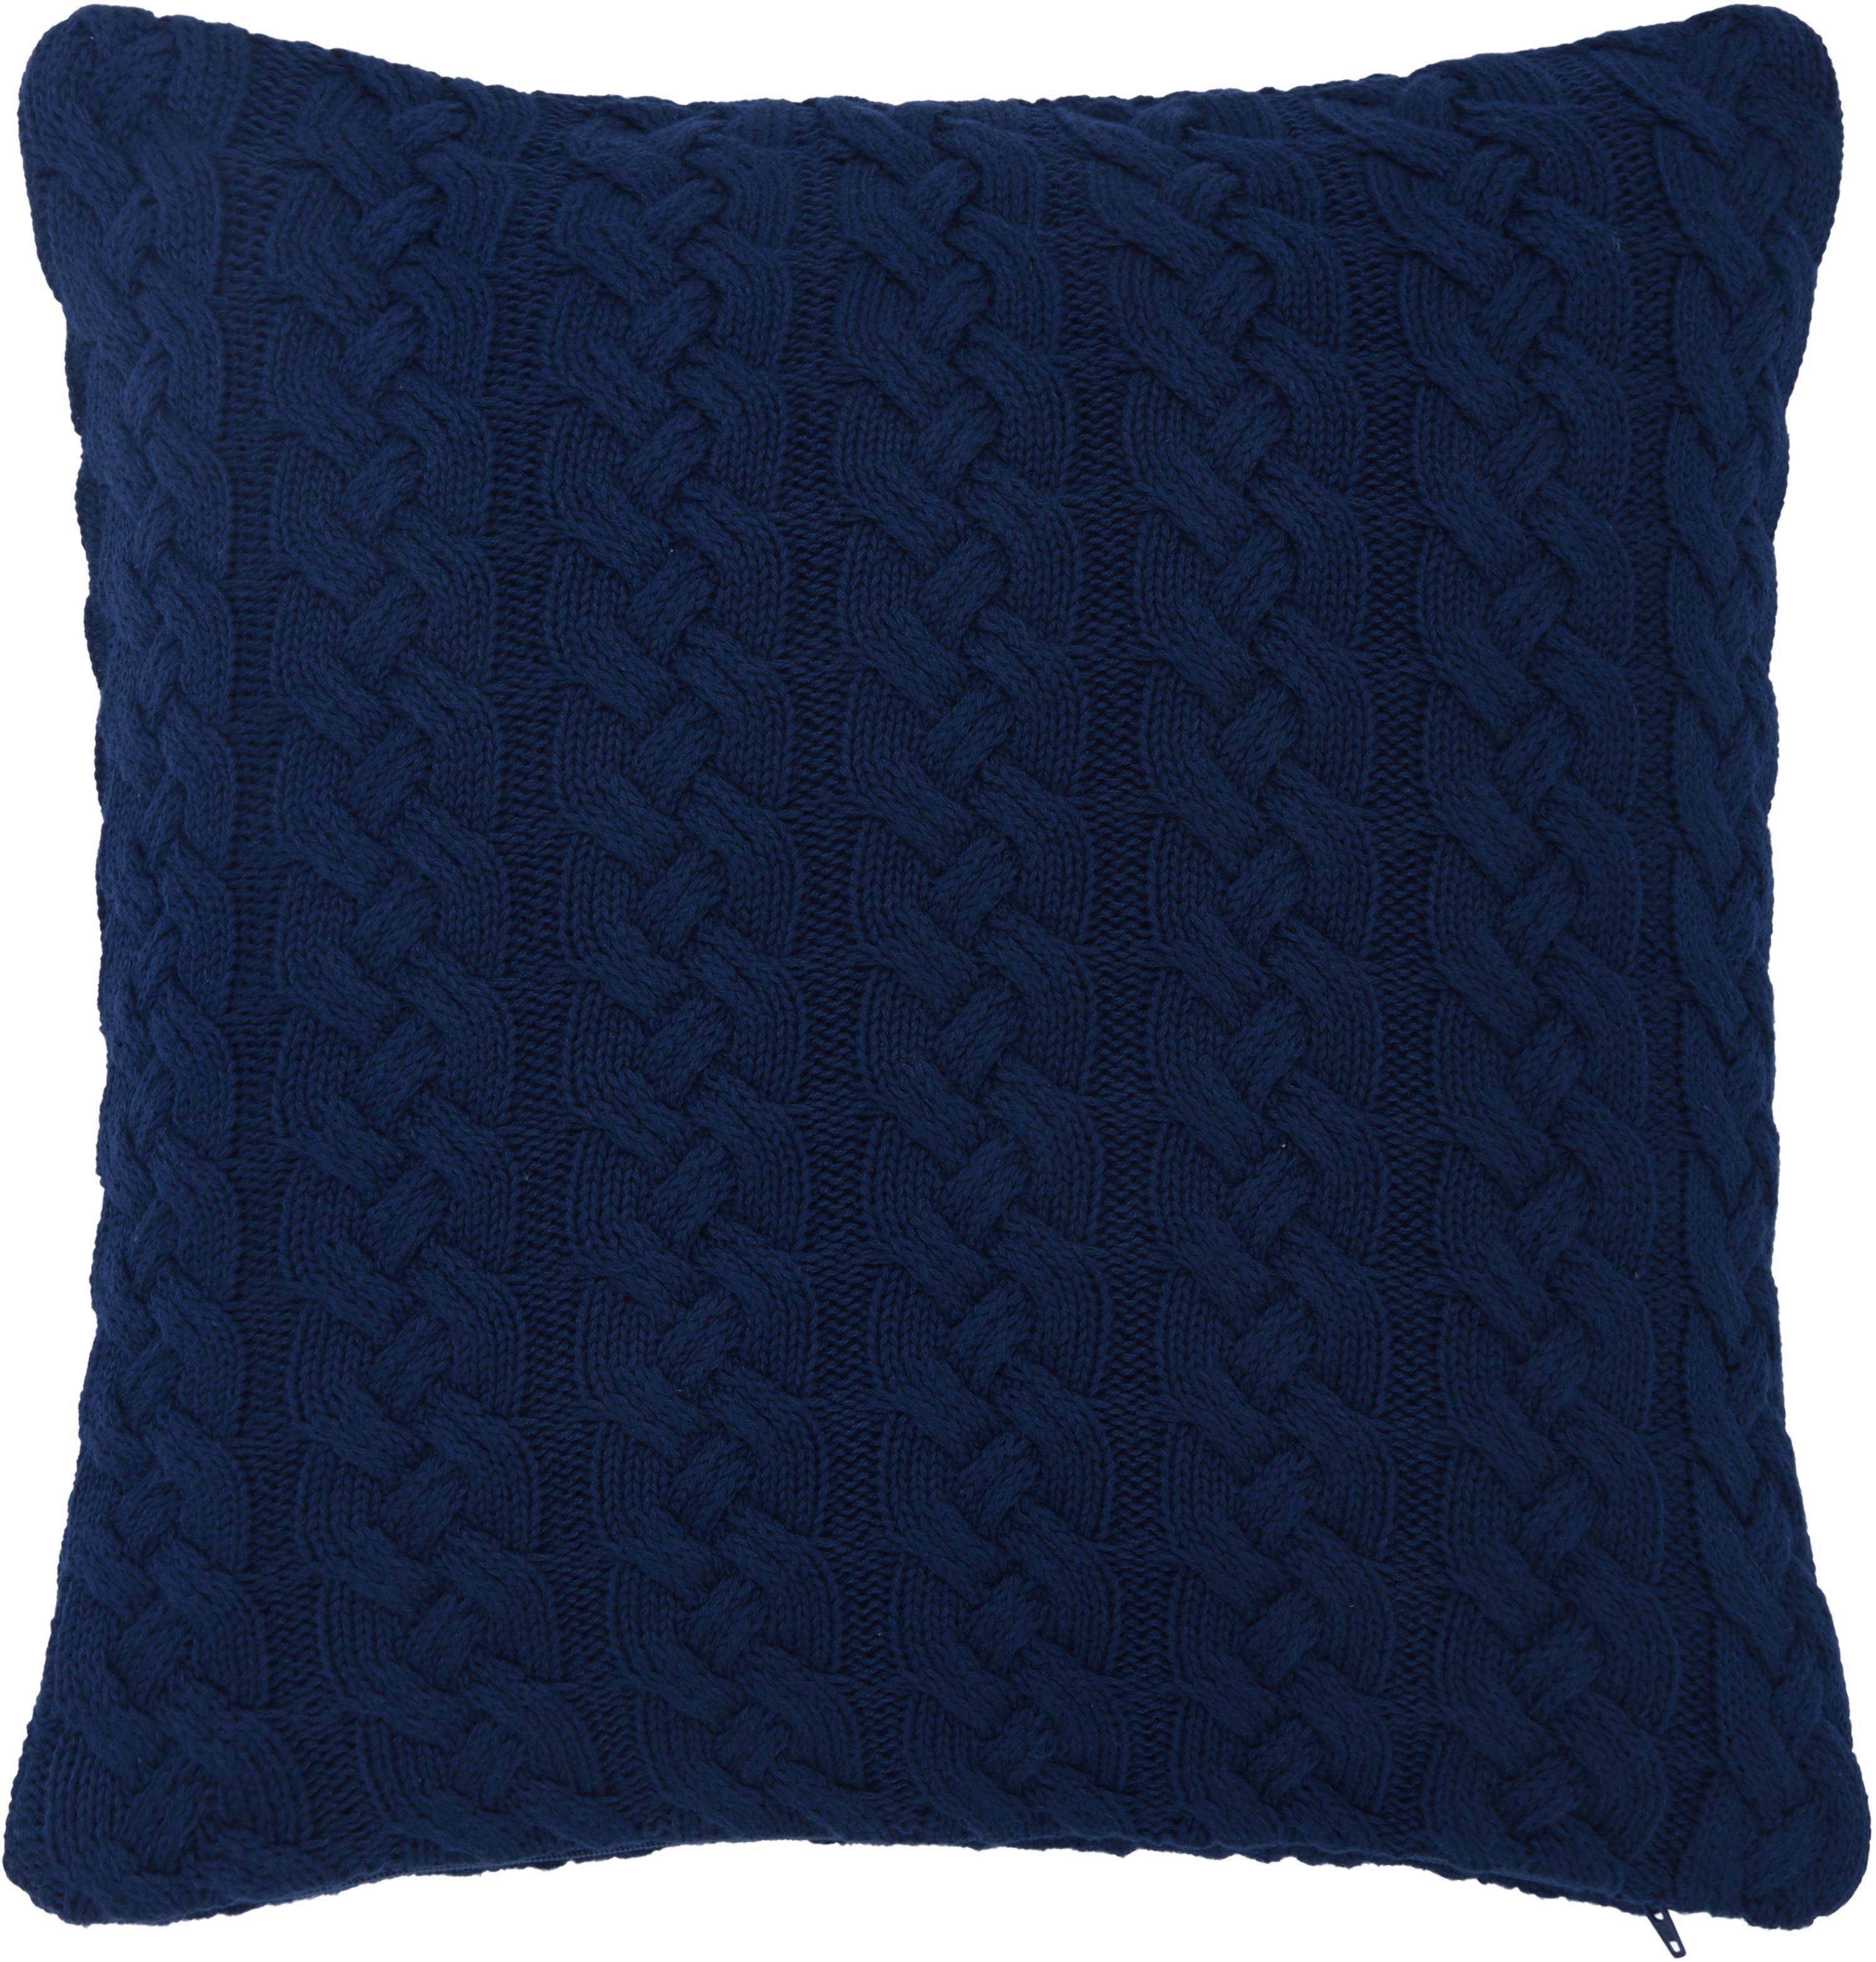 Strick-Kissenhülle Caleb mit Zopfmuster, 100% Baumwolle, Blau, 40 x 40 cm